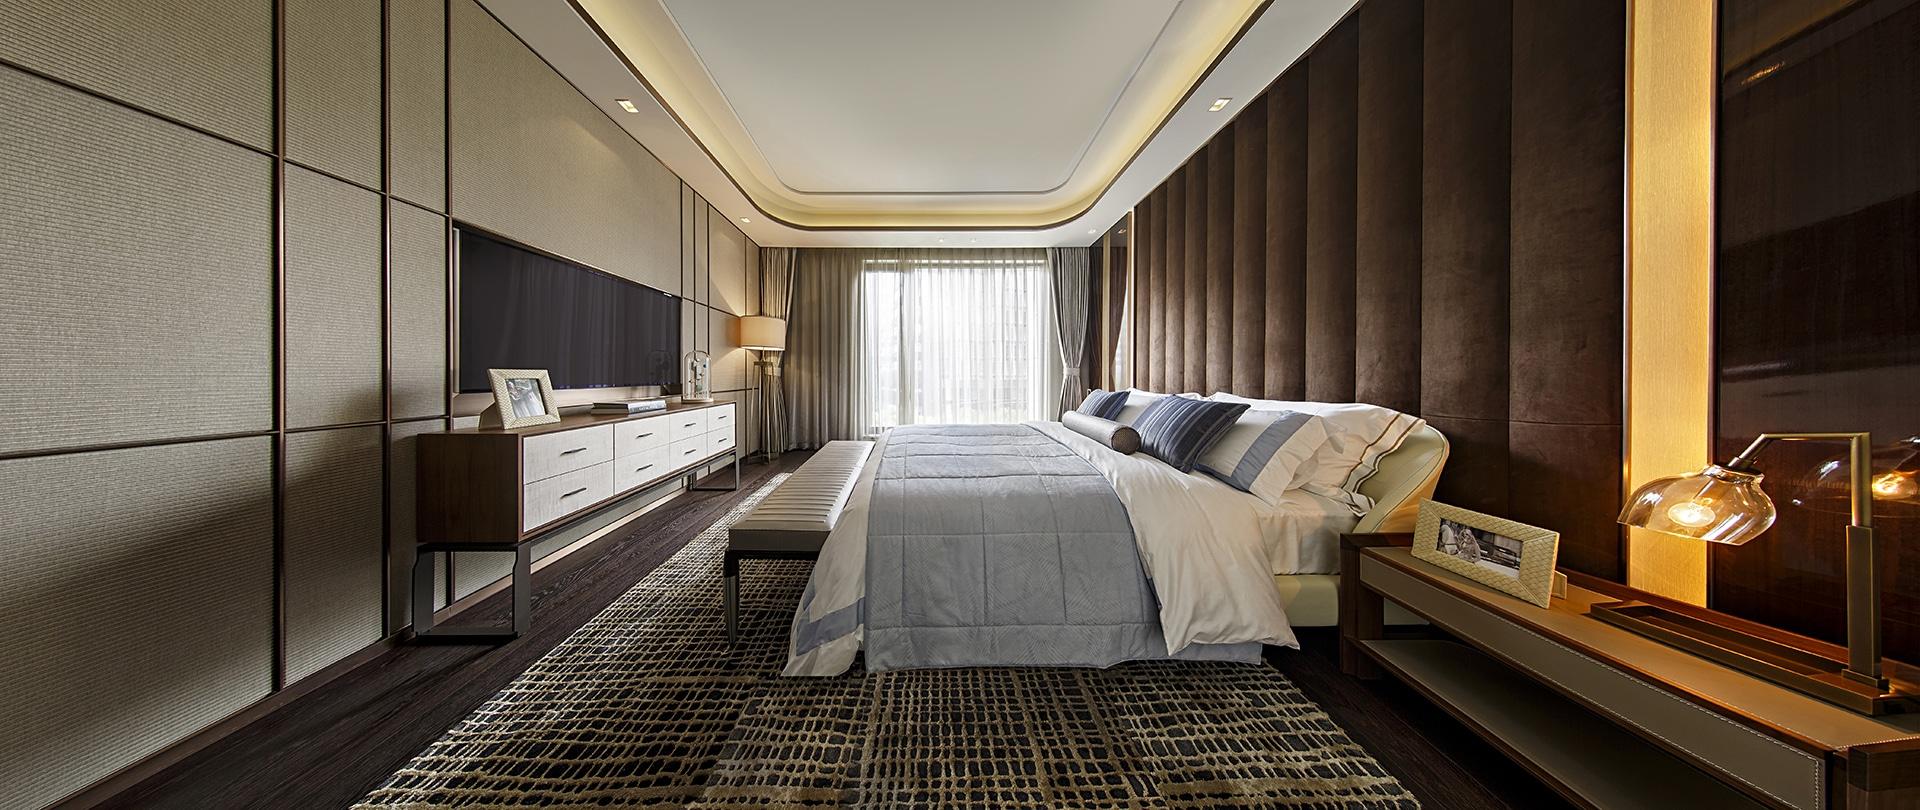 China, Bedroom, Bedroom Interiors, Bedroom Design, Interior Design, Shanghai, China